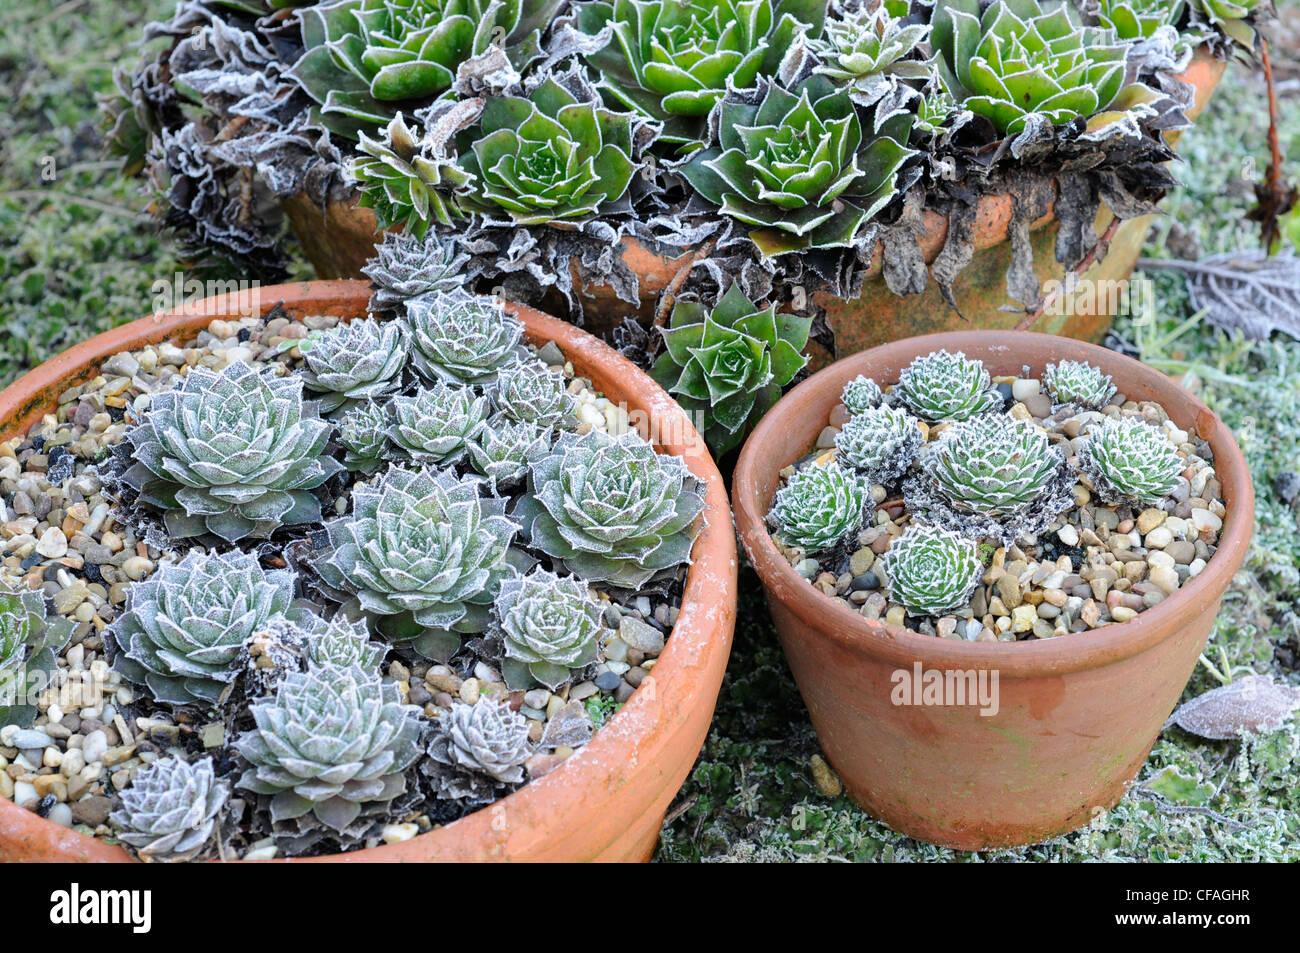 Frost Garden Pots Frost garden pots stock photos frost garden pots stock images alamy frosty garden with plants in pots including sempervivums uk december stock image workwithnaturefo